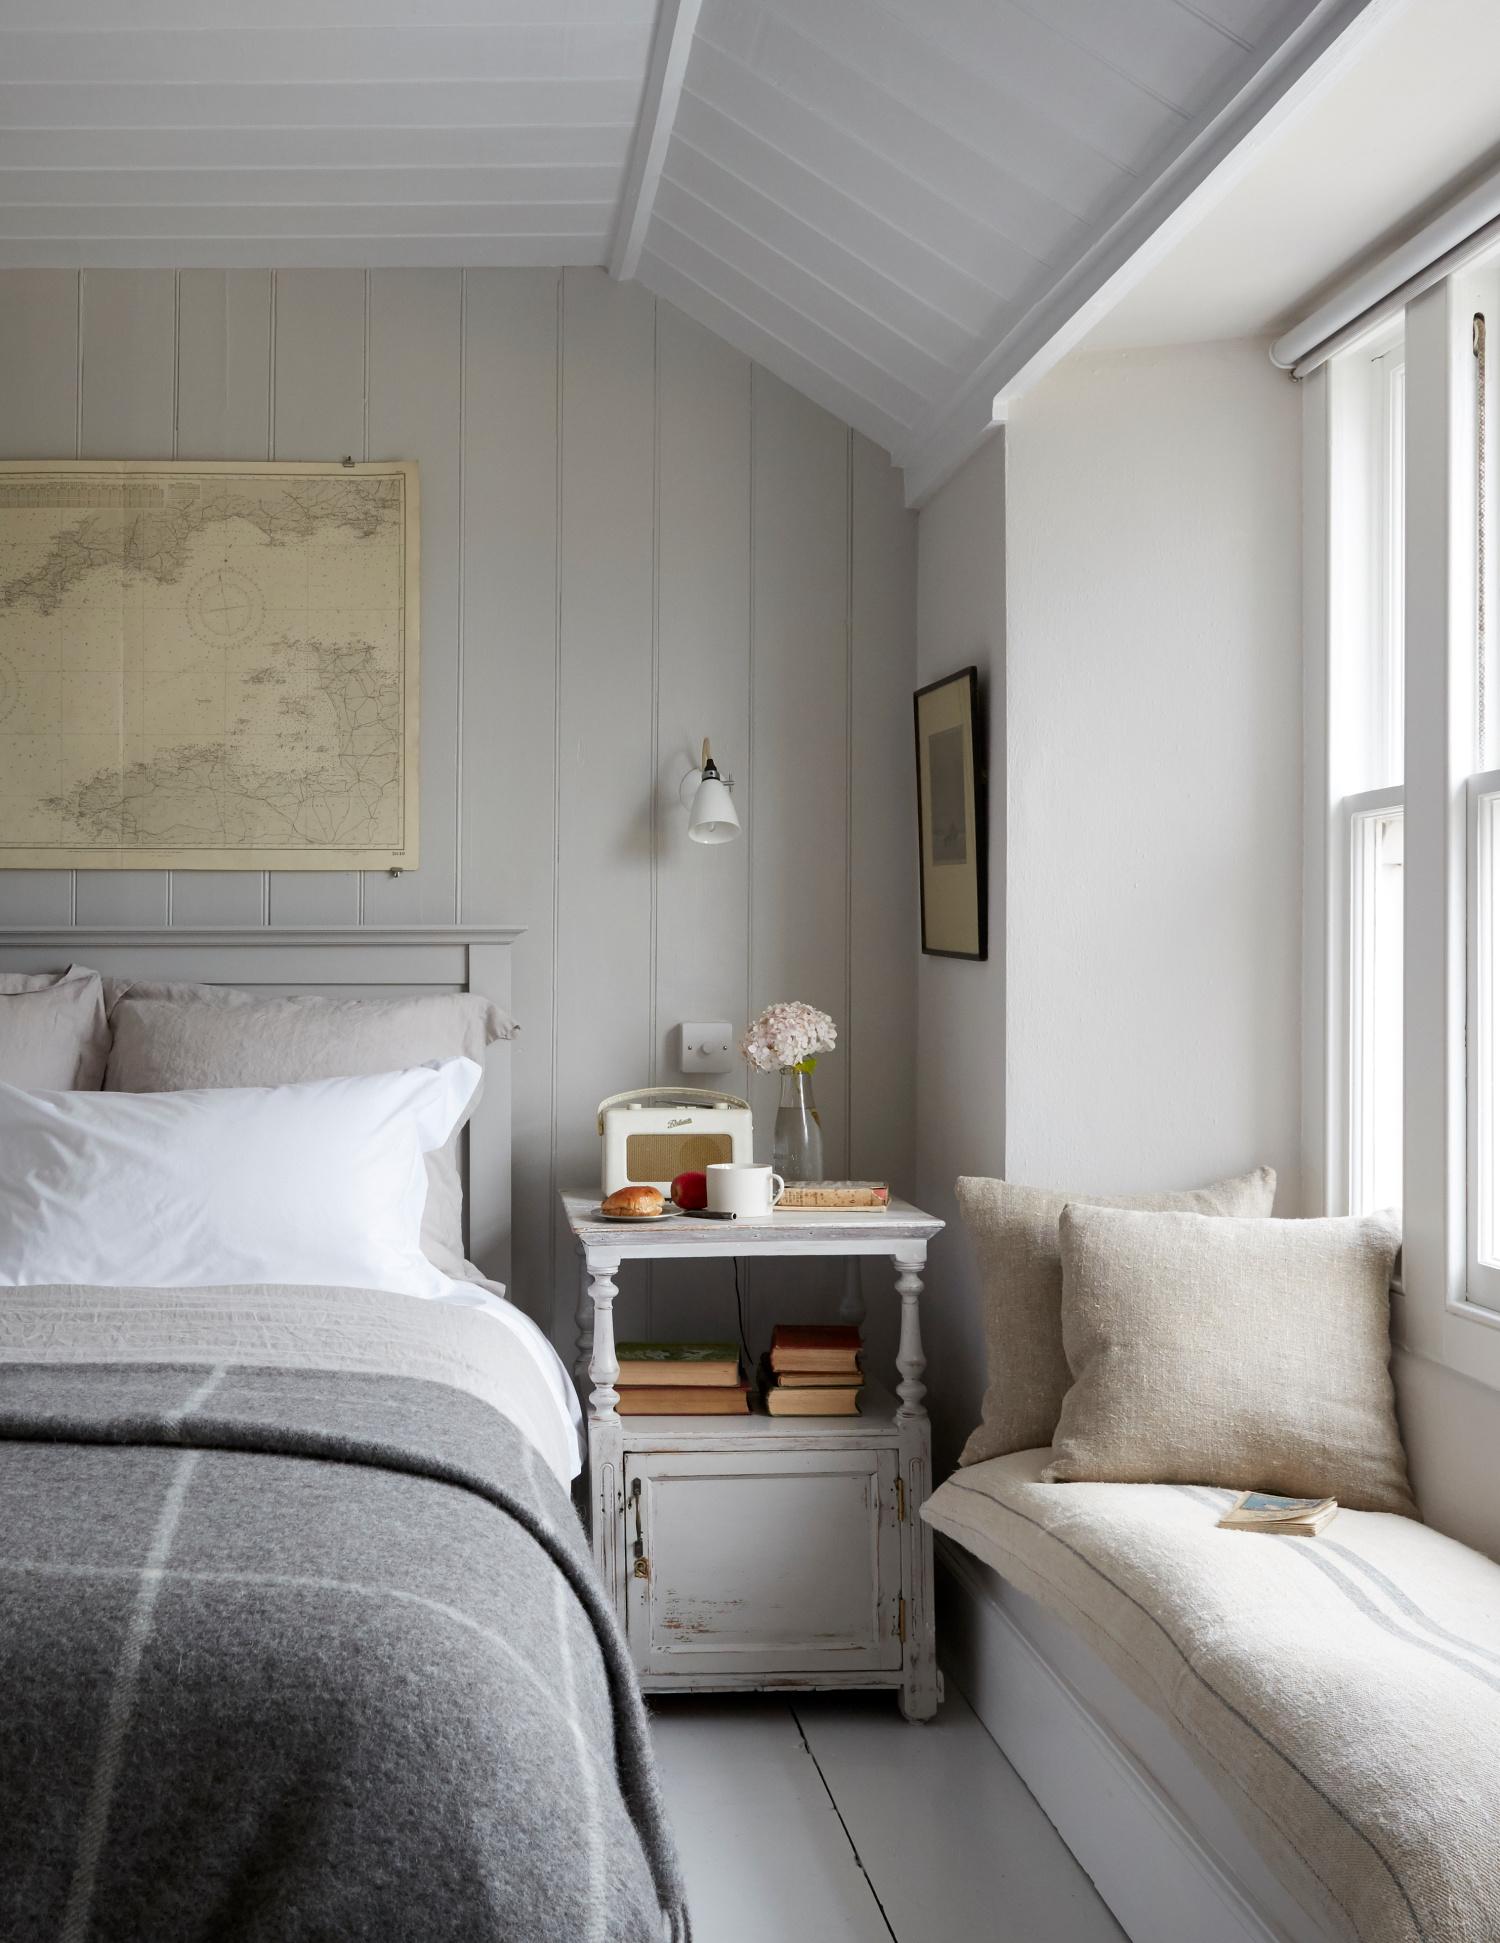 Unique places to stay - Unique Home Stays - Herringbone - Humphrey Munson